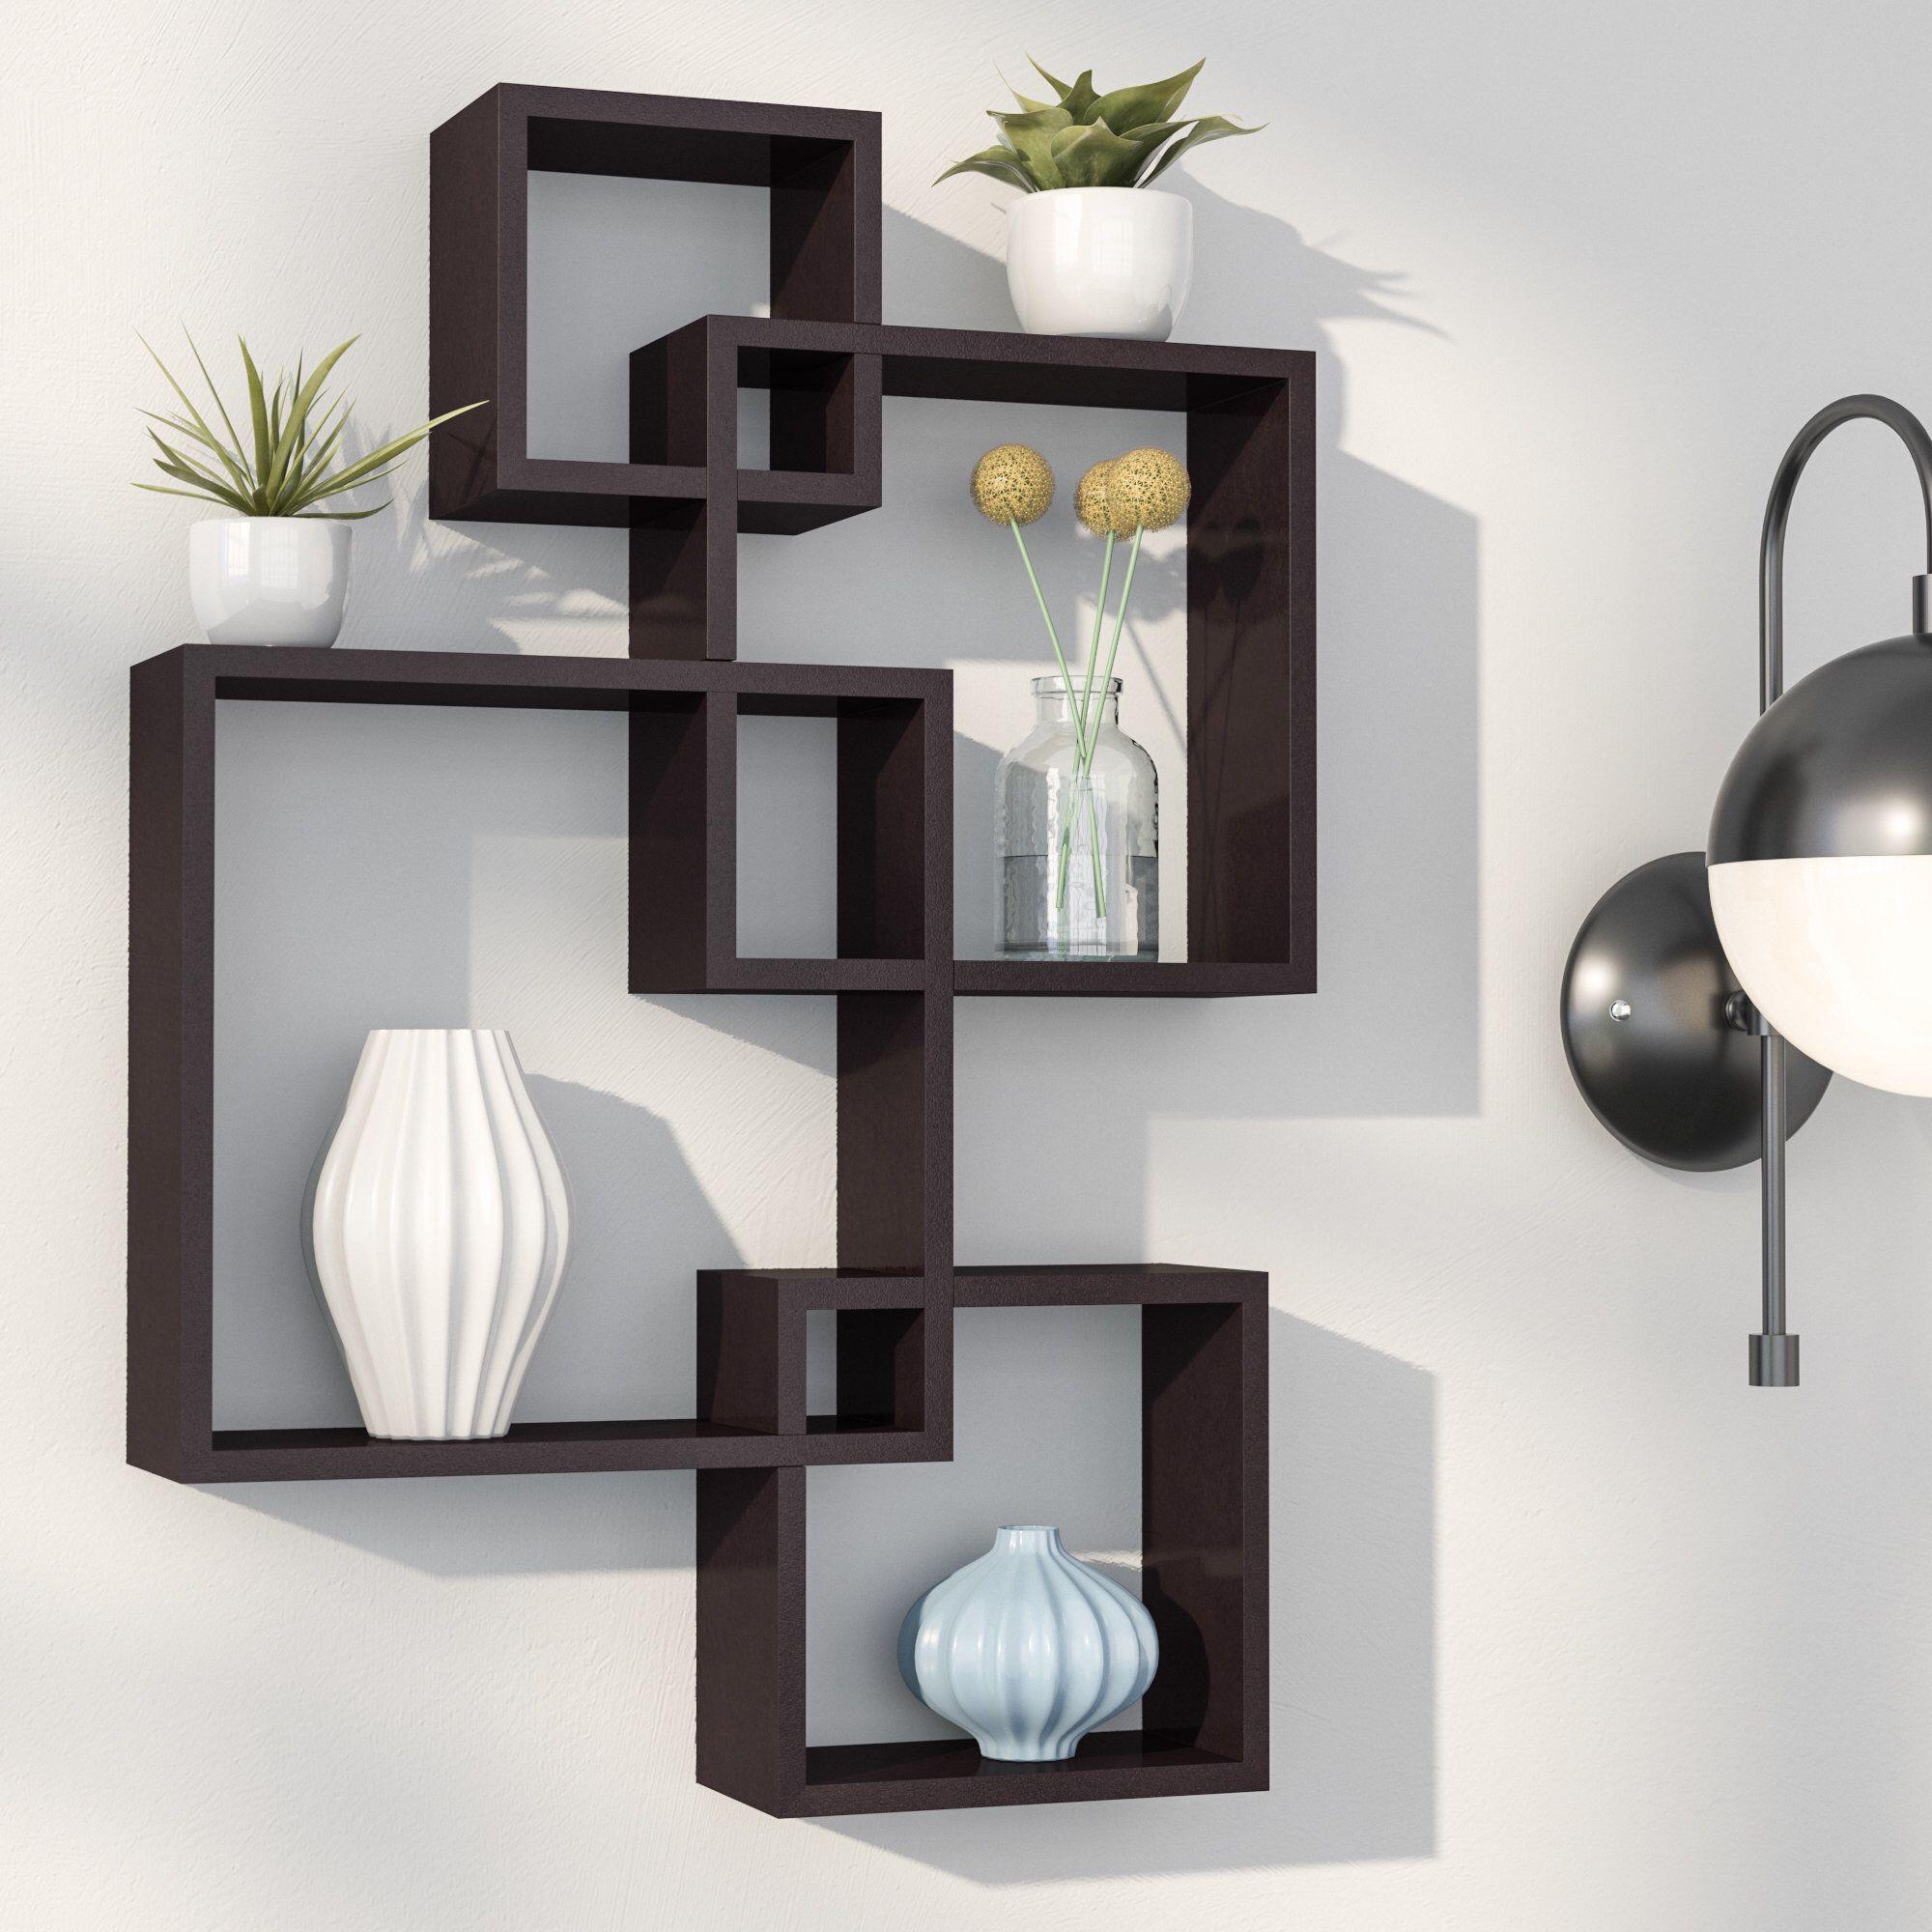 Langley Street Spoon Intersecting Cubes Shelf Em 2019 Mi Sala